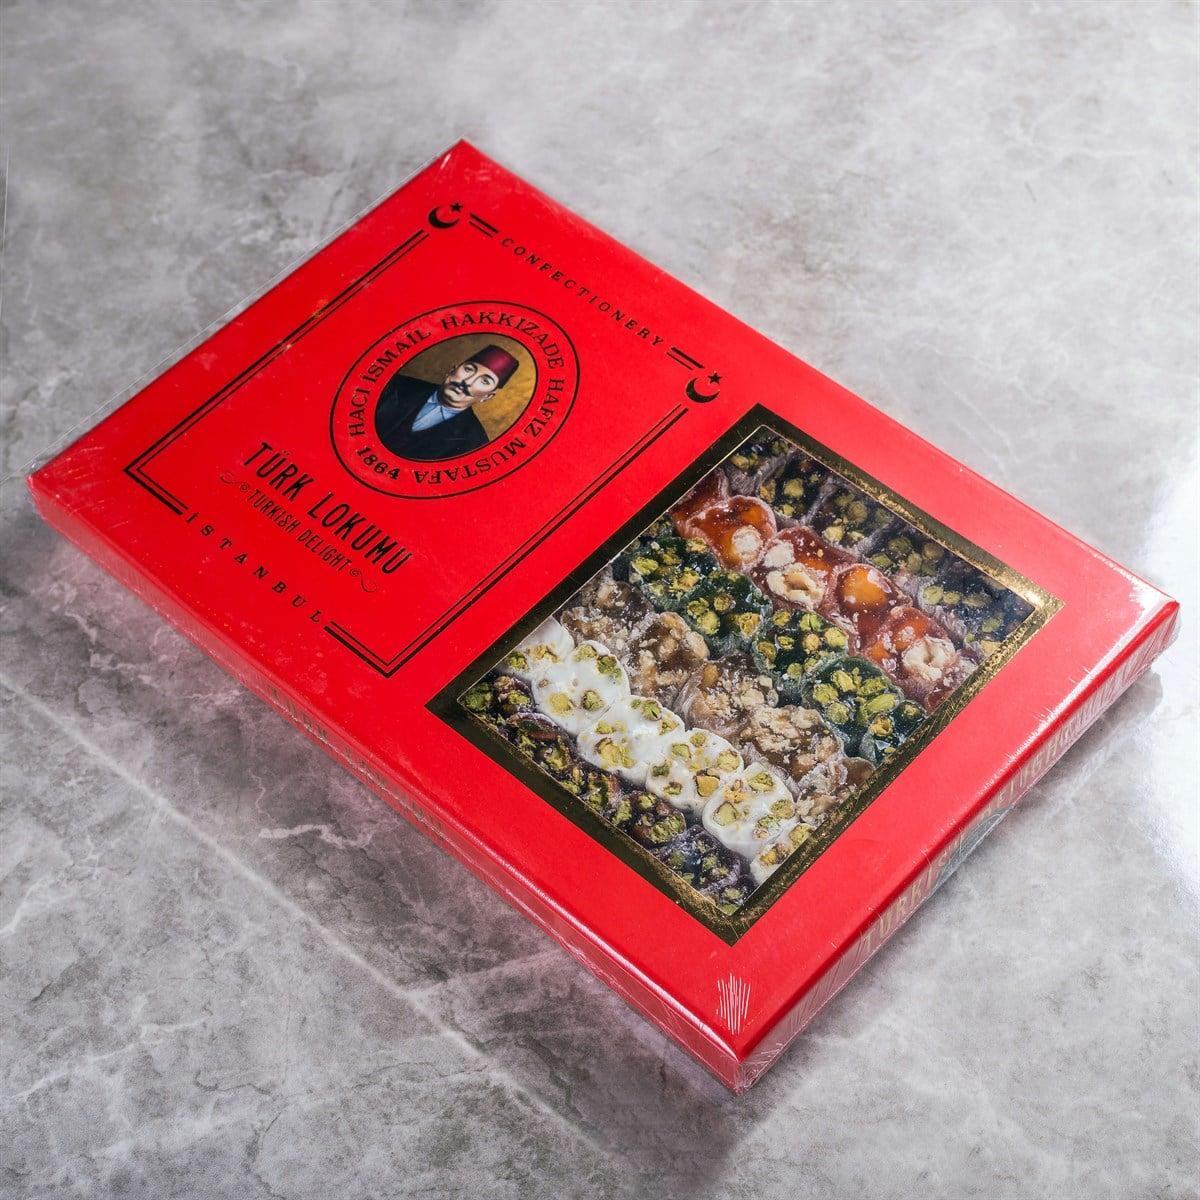 Hafiz Mustafa - Assorted Turkish Delight 250 g hafiz gertrude lowthian bell the selected poems of hafiz